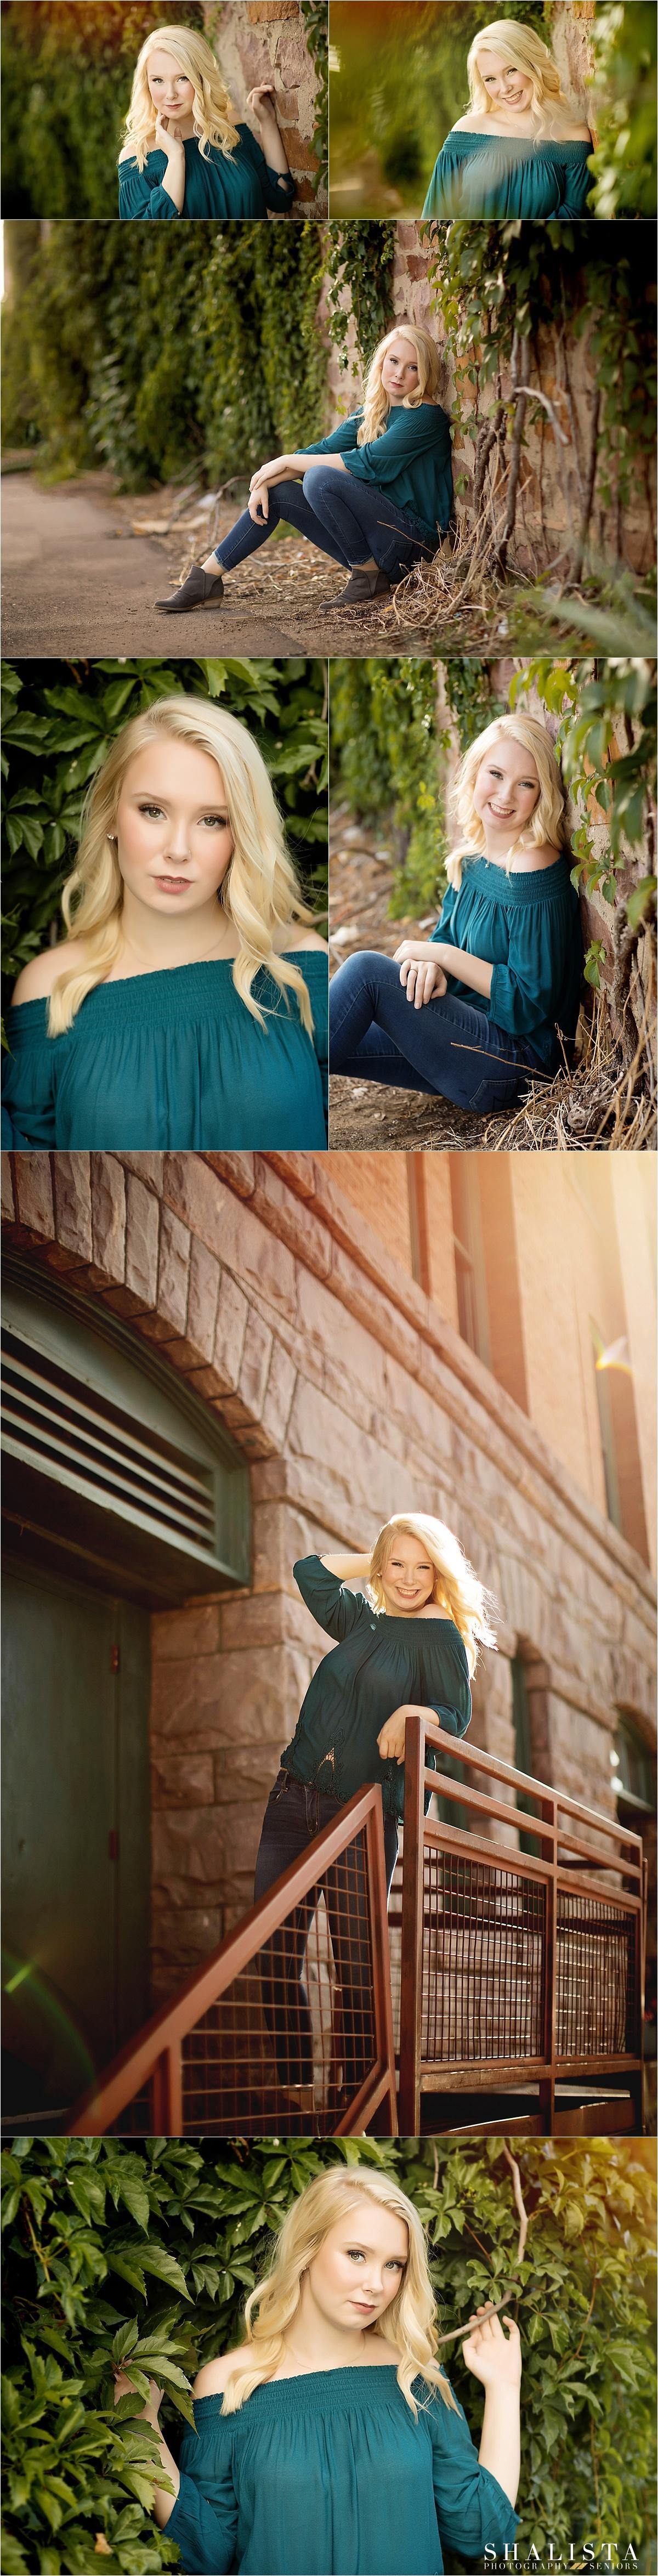 Kara Harms - Tea Area High School Senior Photos